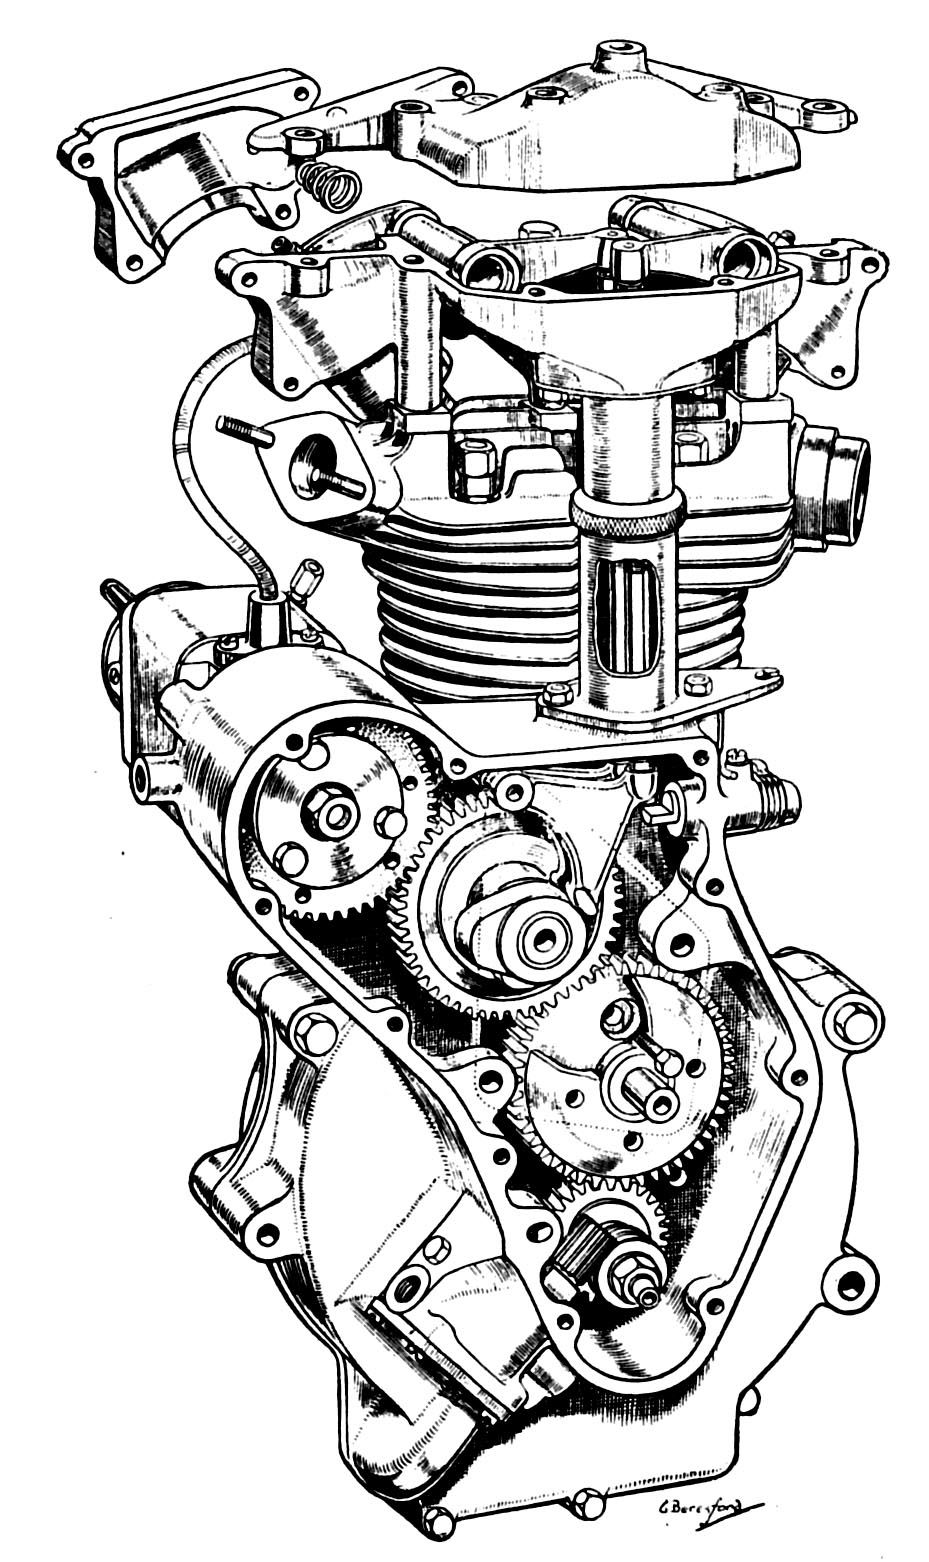 hight resolution of cutaway view of the 1973 kawasaki z1 900 engine description from pinterest com